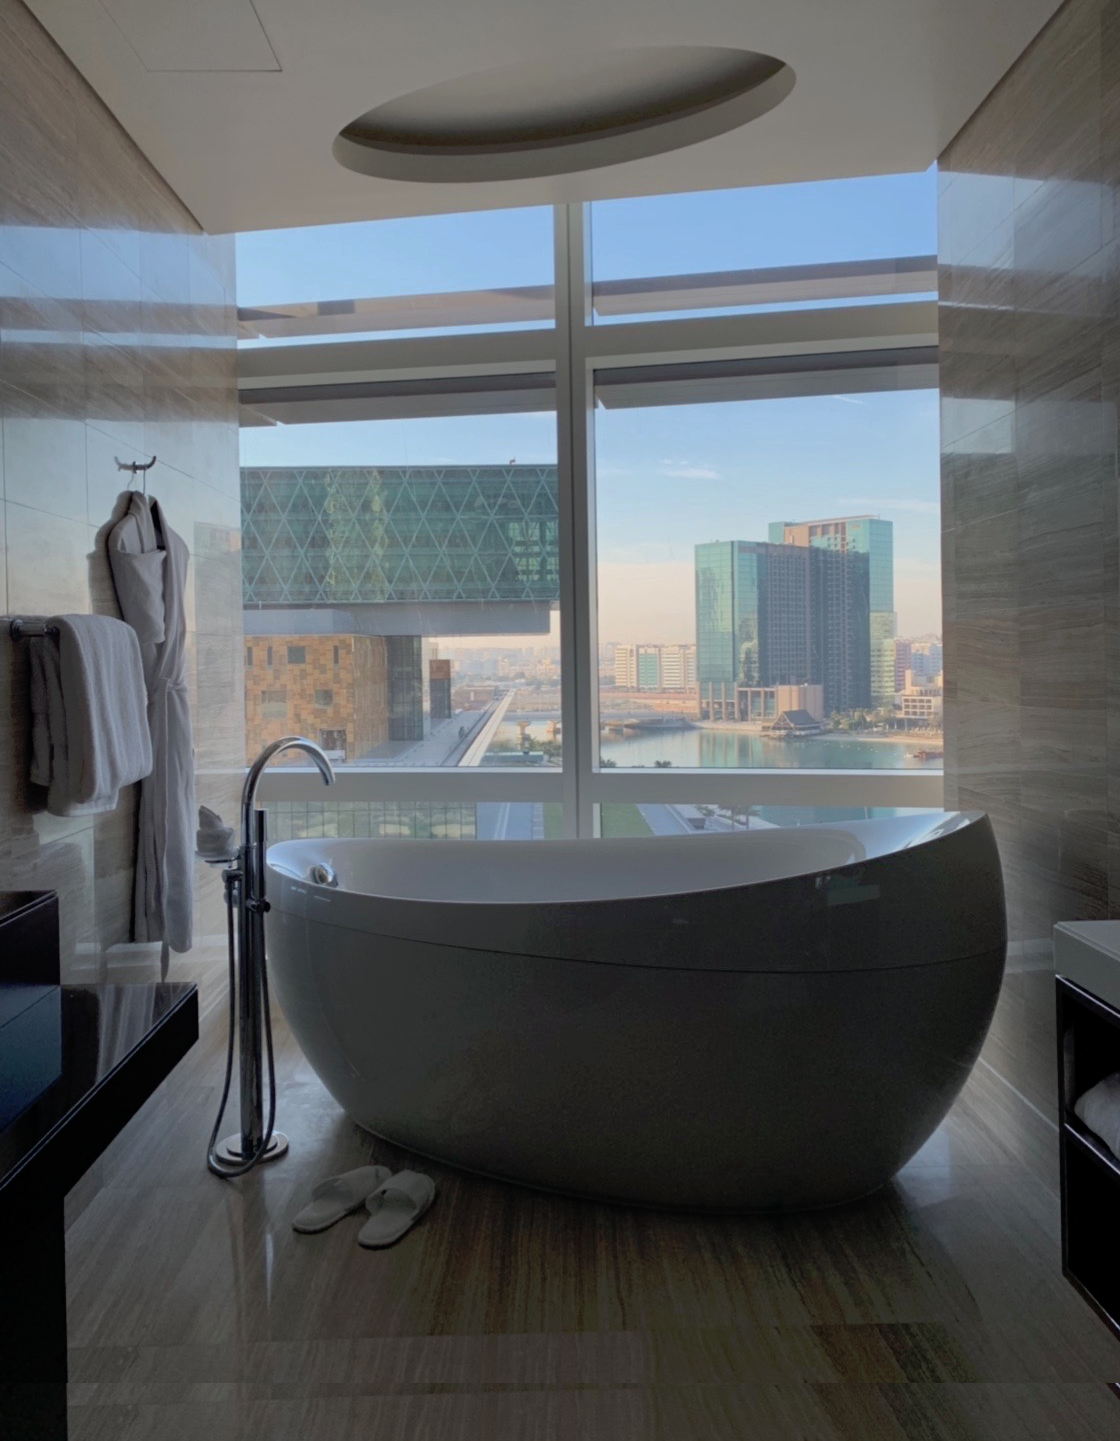 Etihad stopover - Rosewood Abu Dhabi by @nakslee